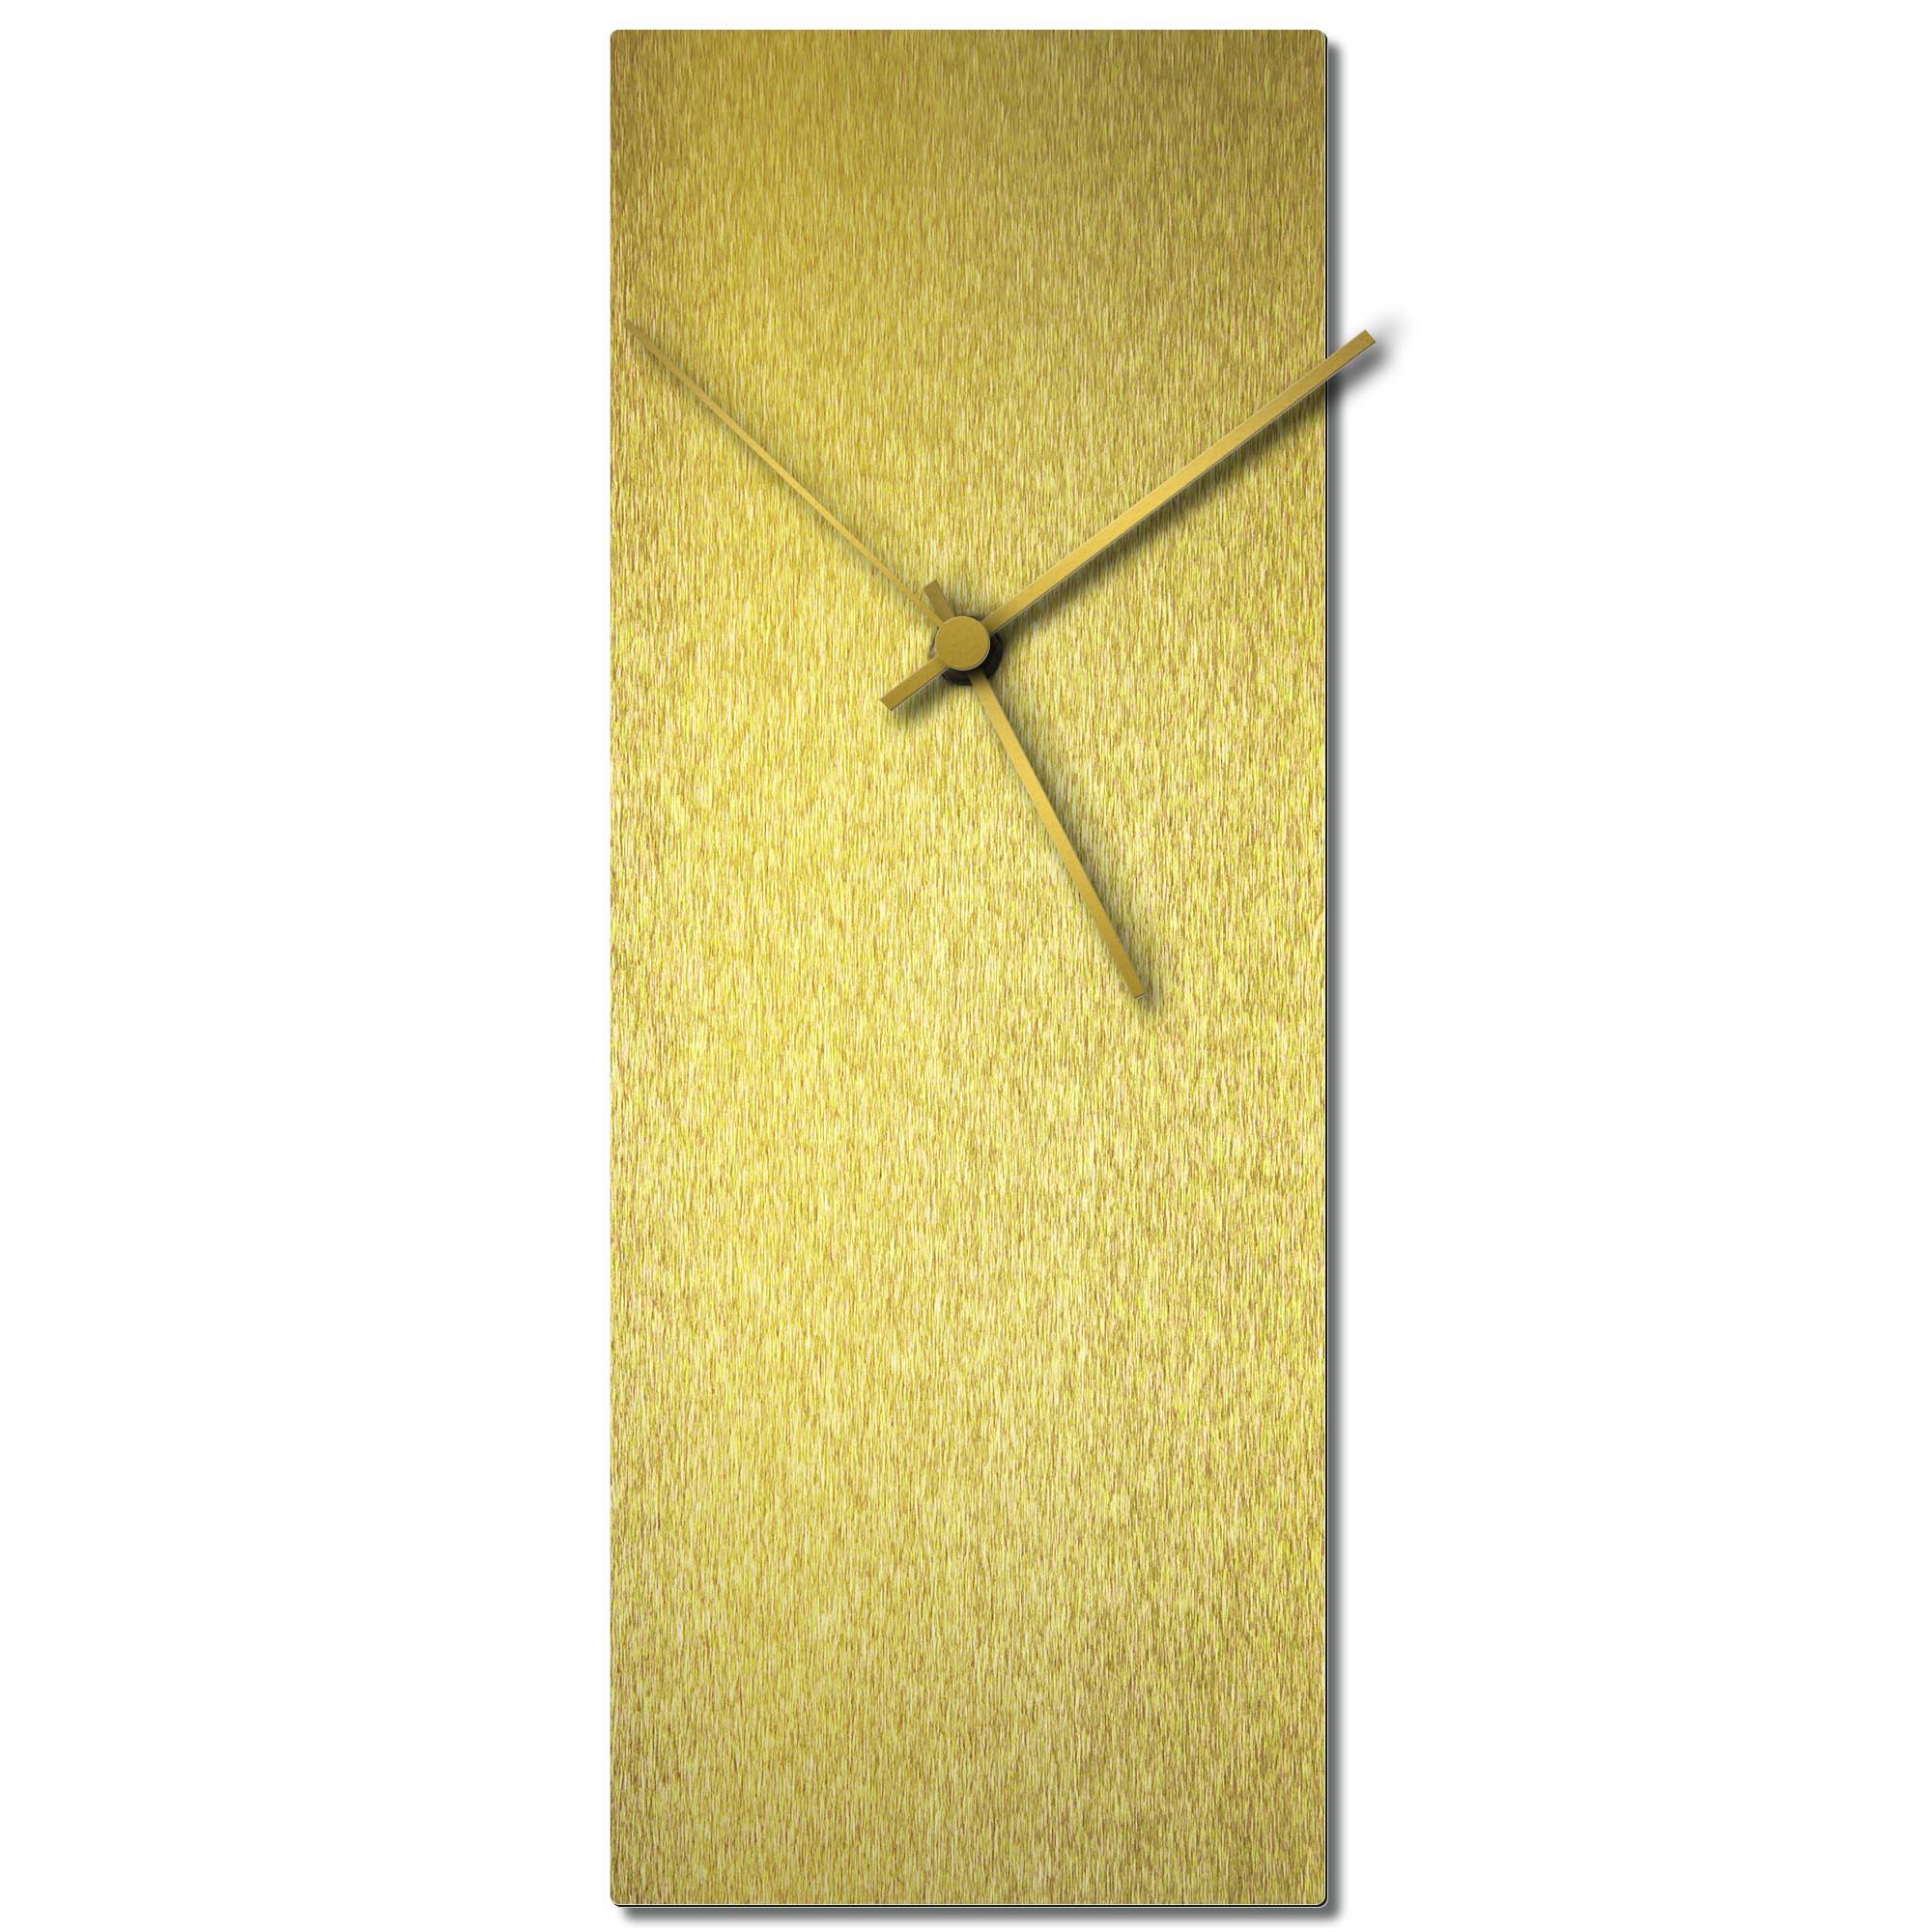 Adam Schwoeppe 'Goldsmith Clock Gold' Midcentury Modern Style Wall Clock